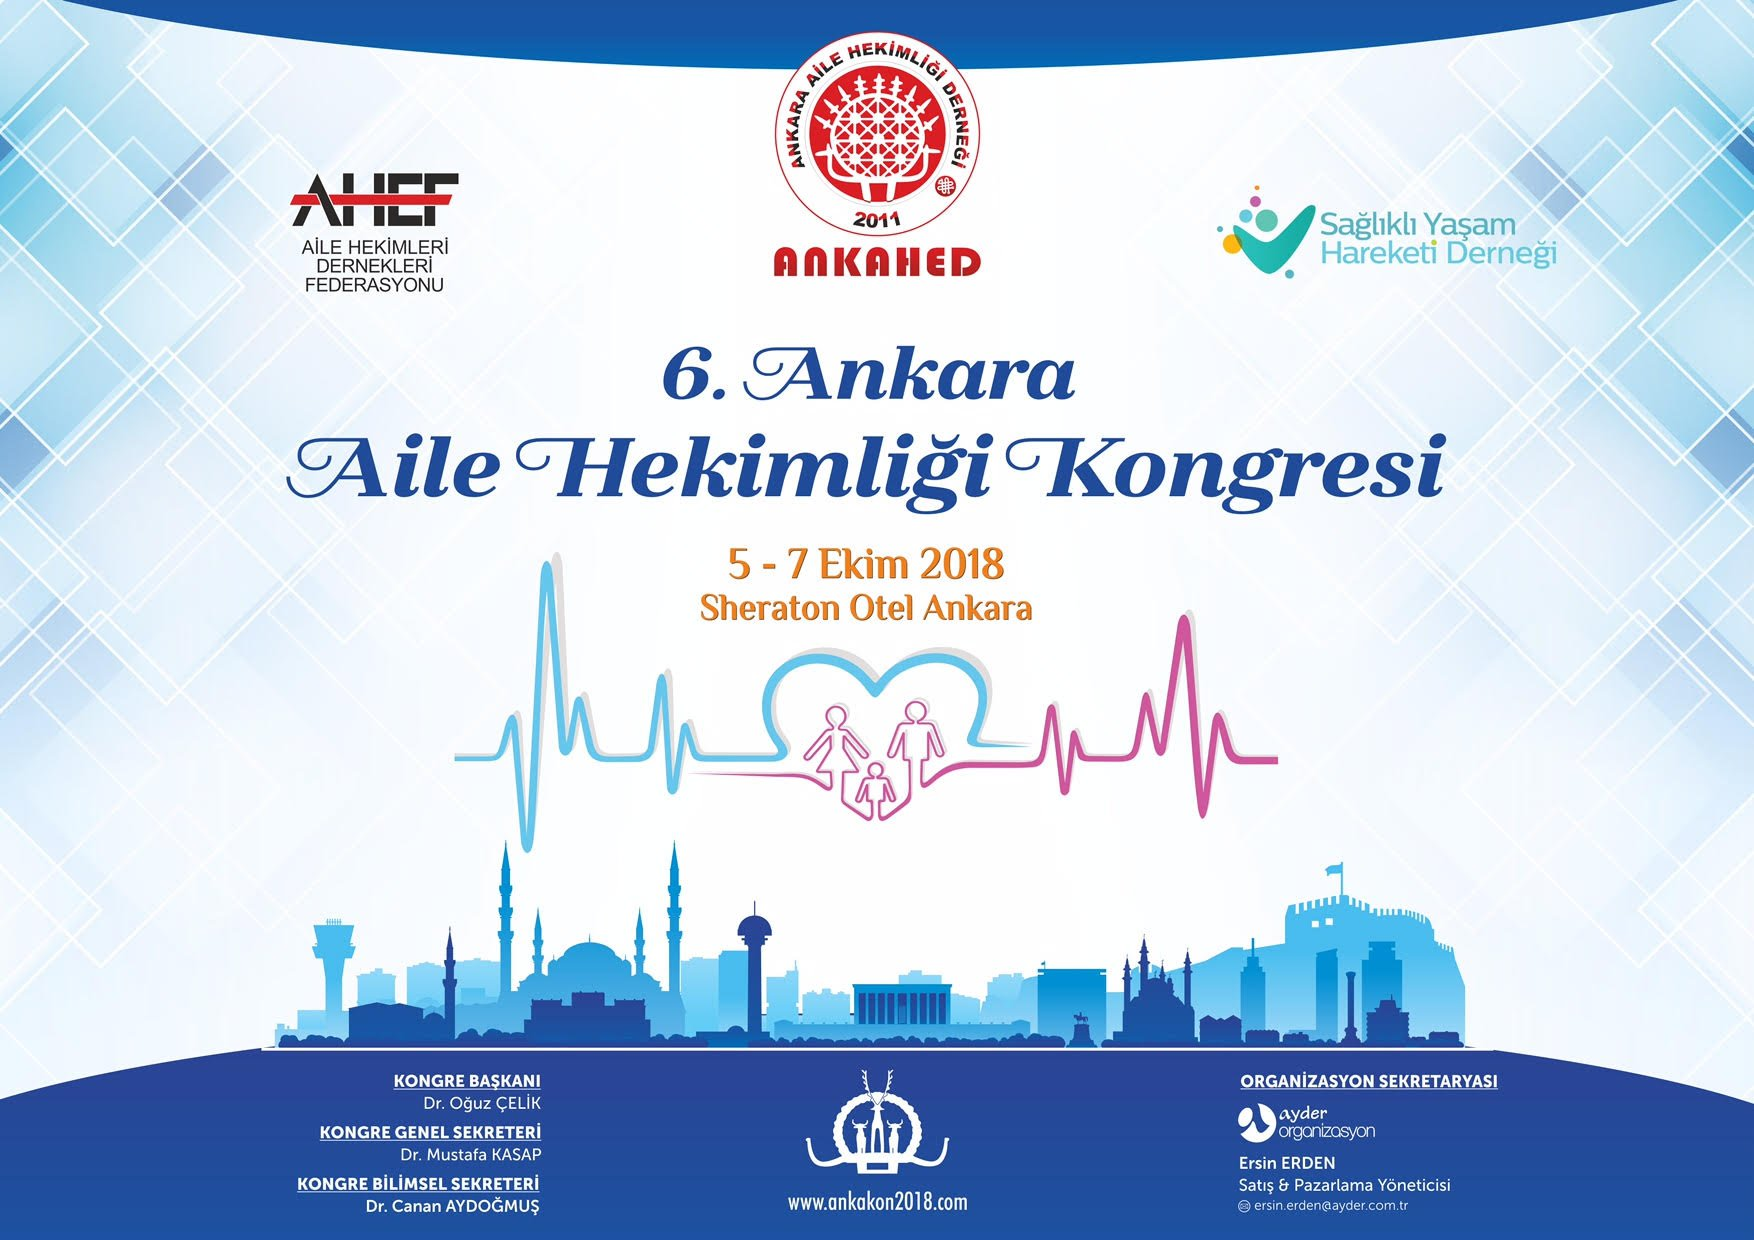 ANKAKON 2018 Kongresi 5-7 Ekim Sheraton Ankara'da